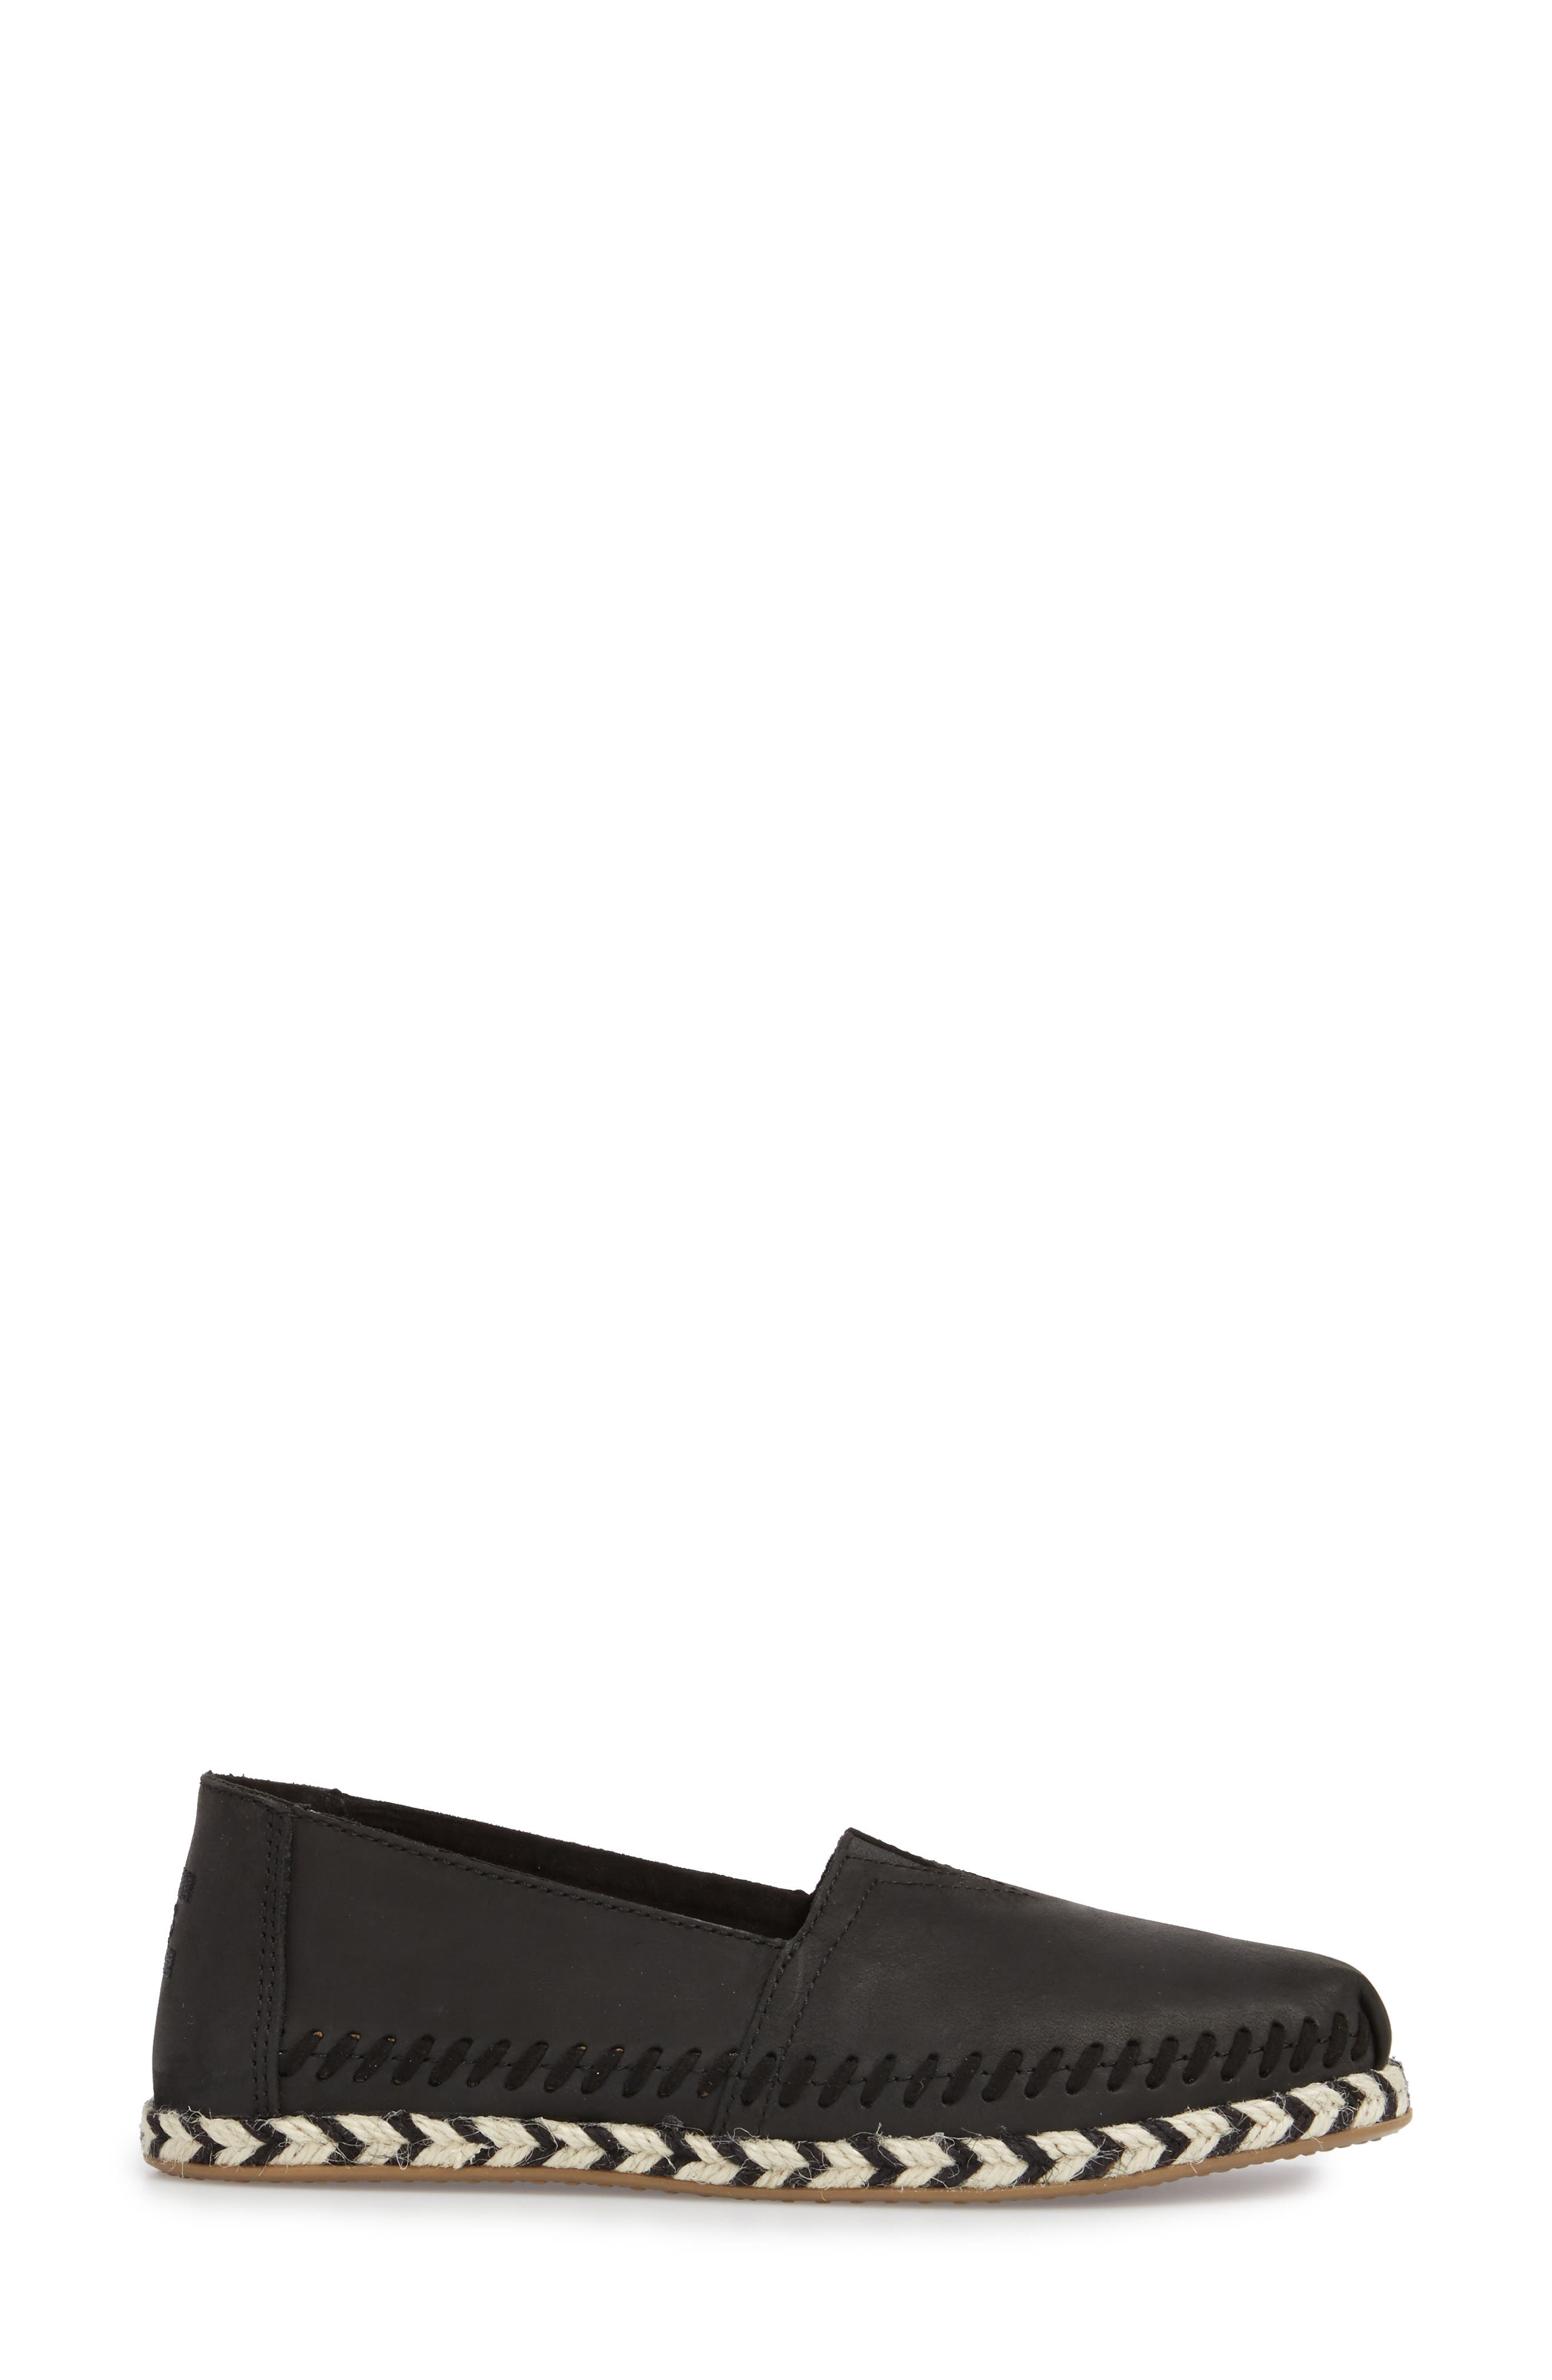 Alpargata Slip-On,                             Alternate thumbnail 3, color,                             Black Leather Rope Sole